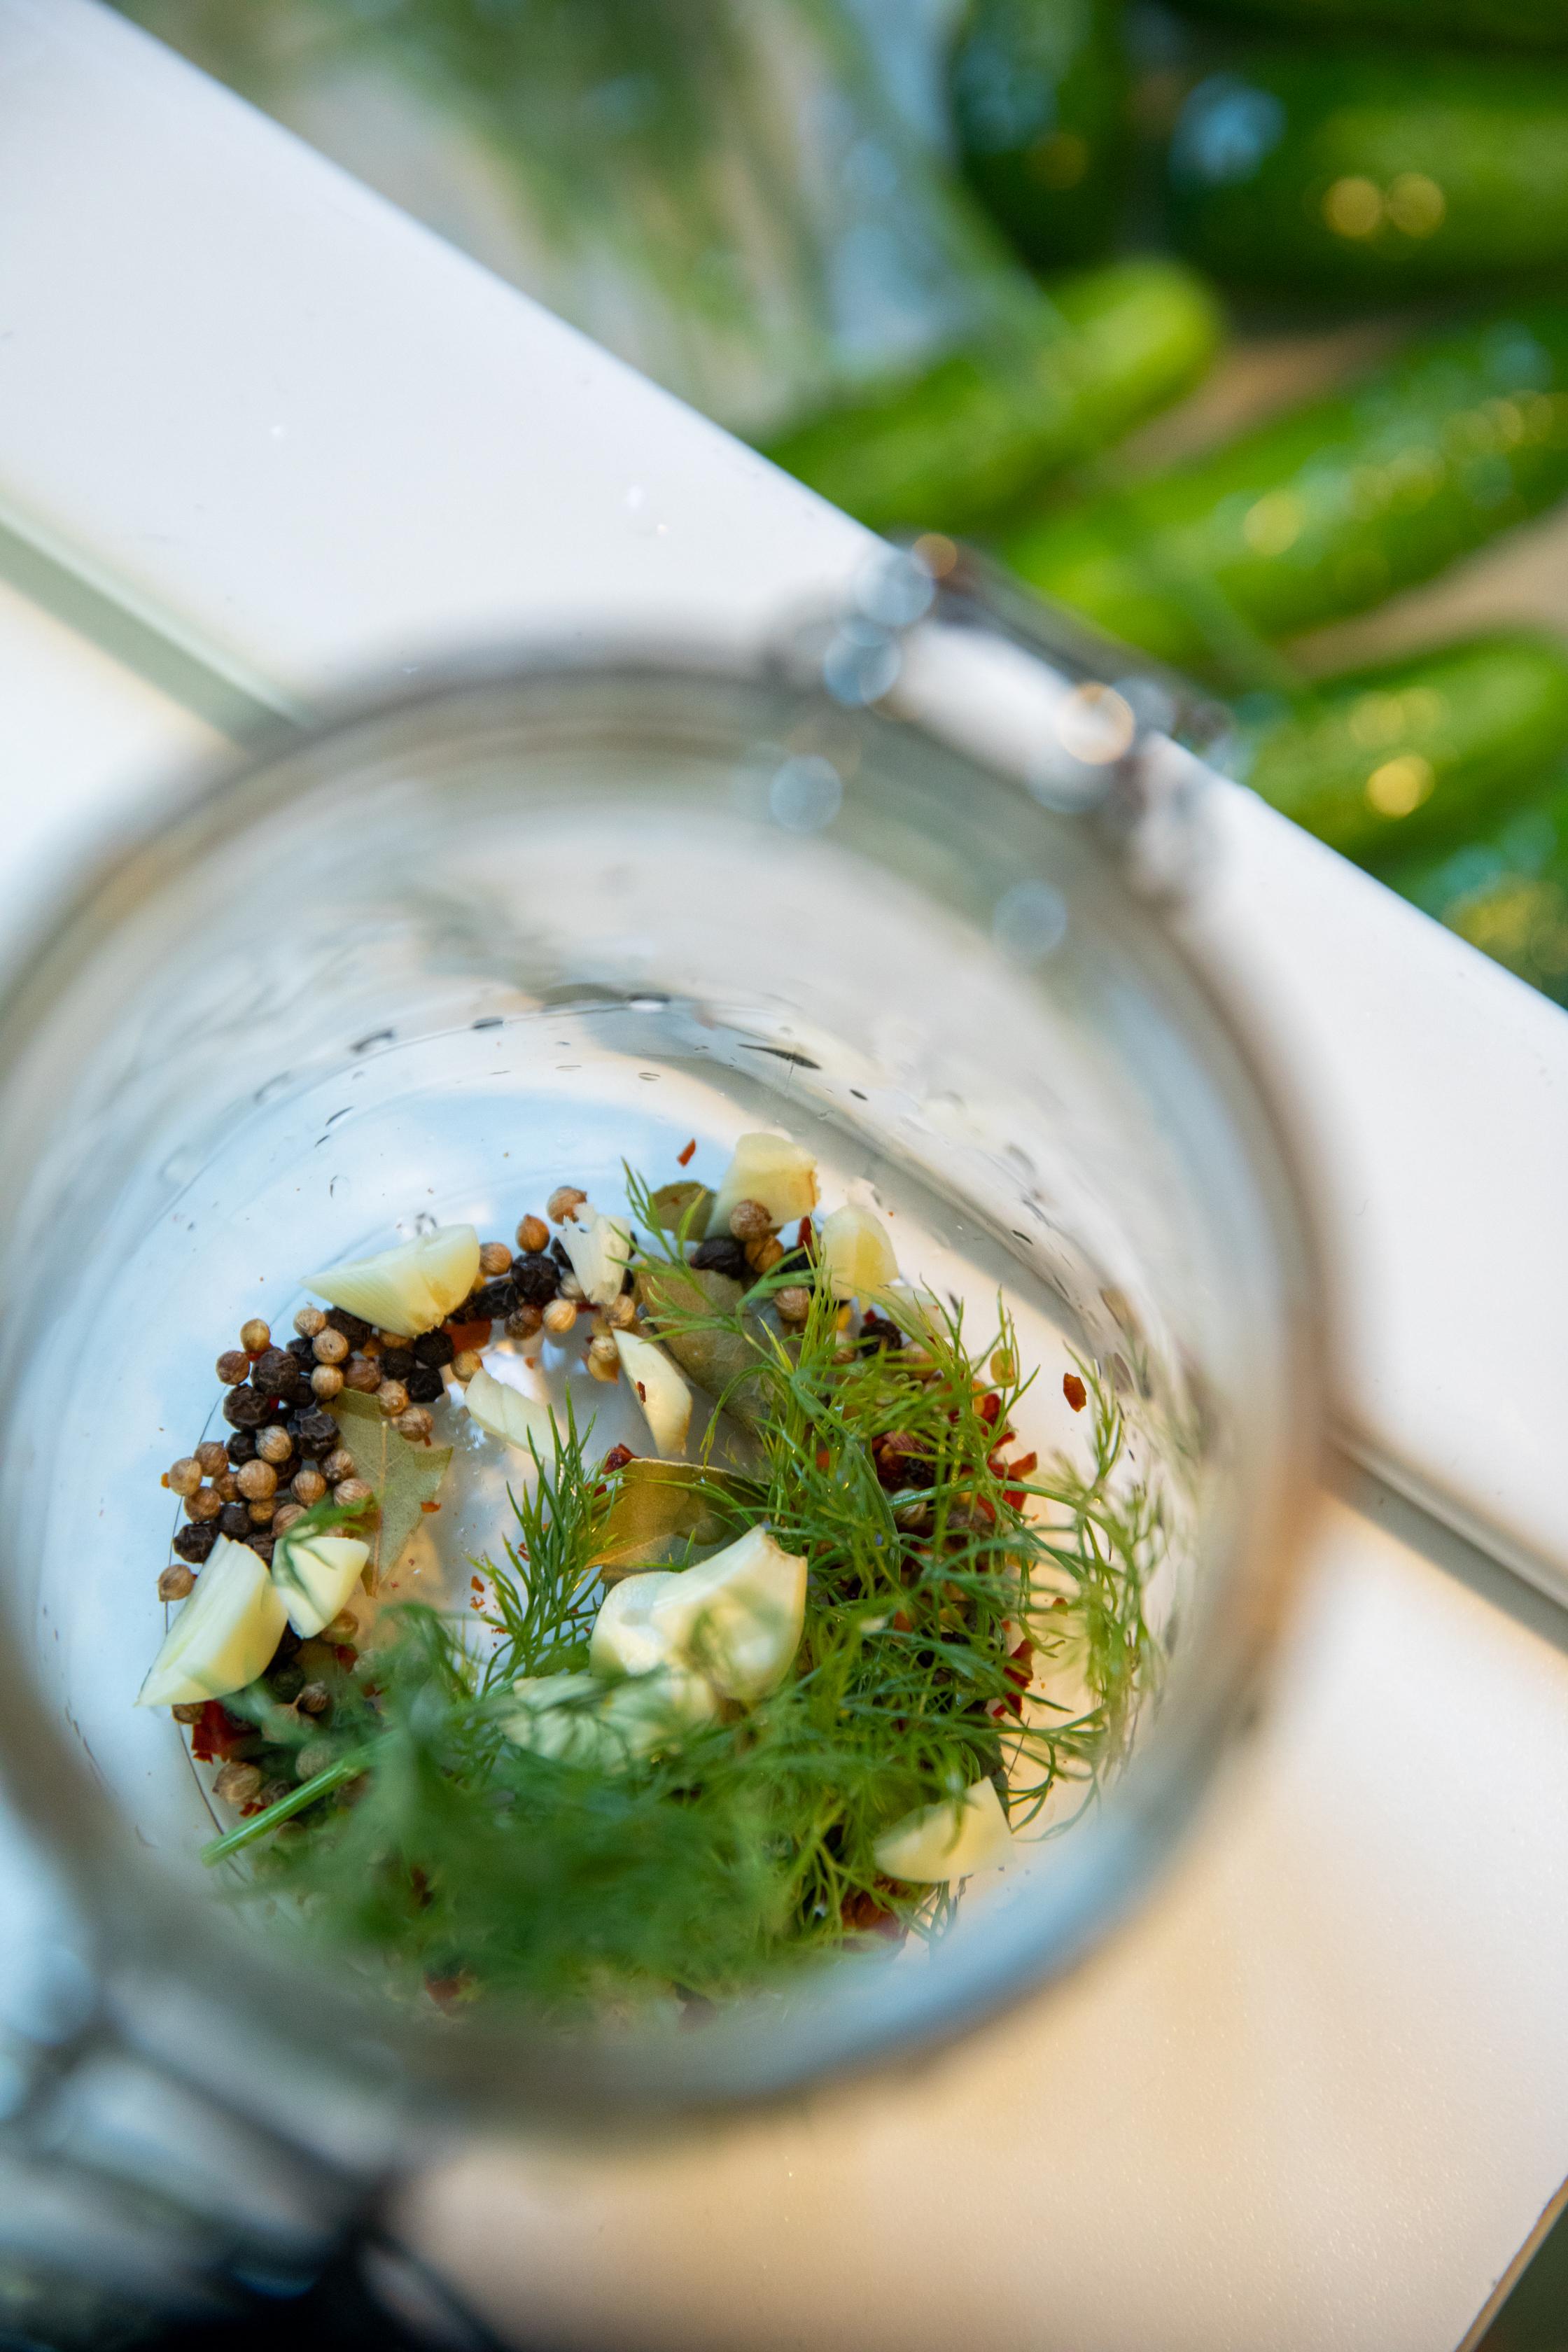 How to make pickles   leavethesandwich.com #picklerecipe #halfsourrecipe